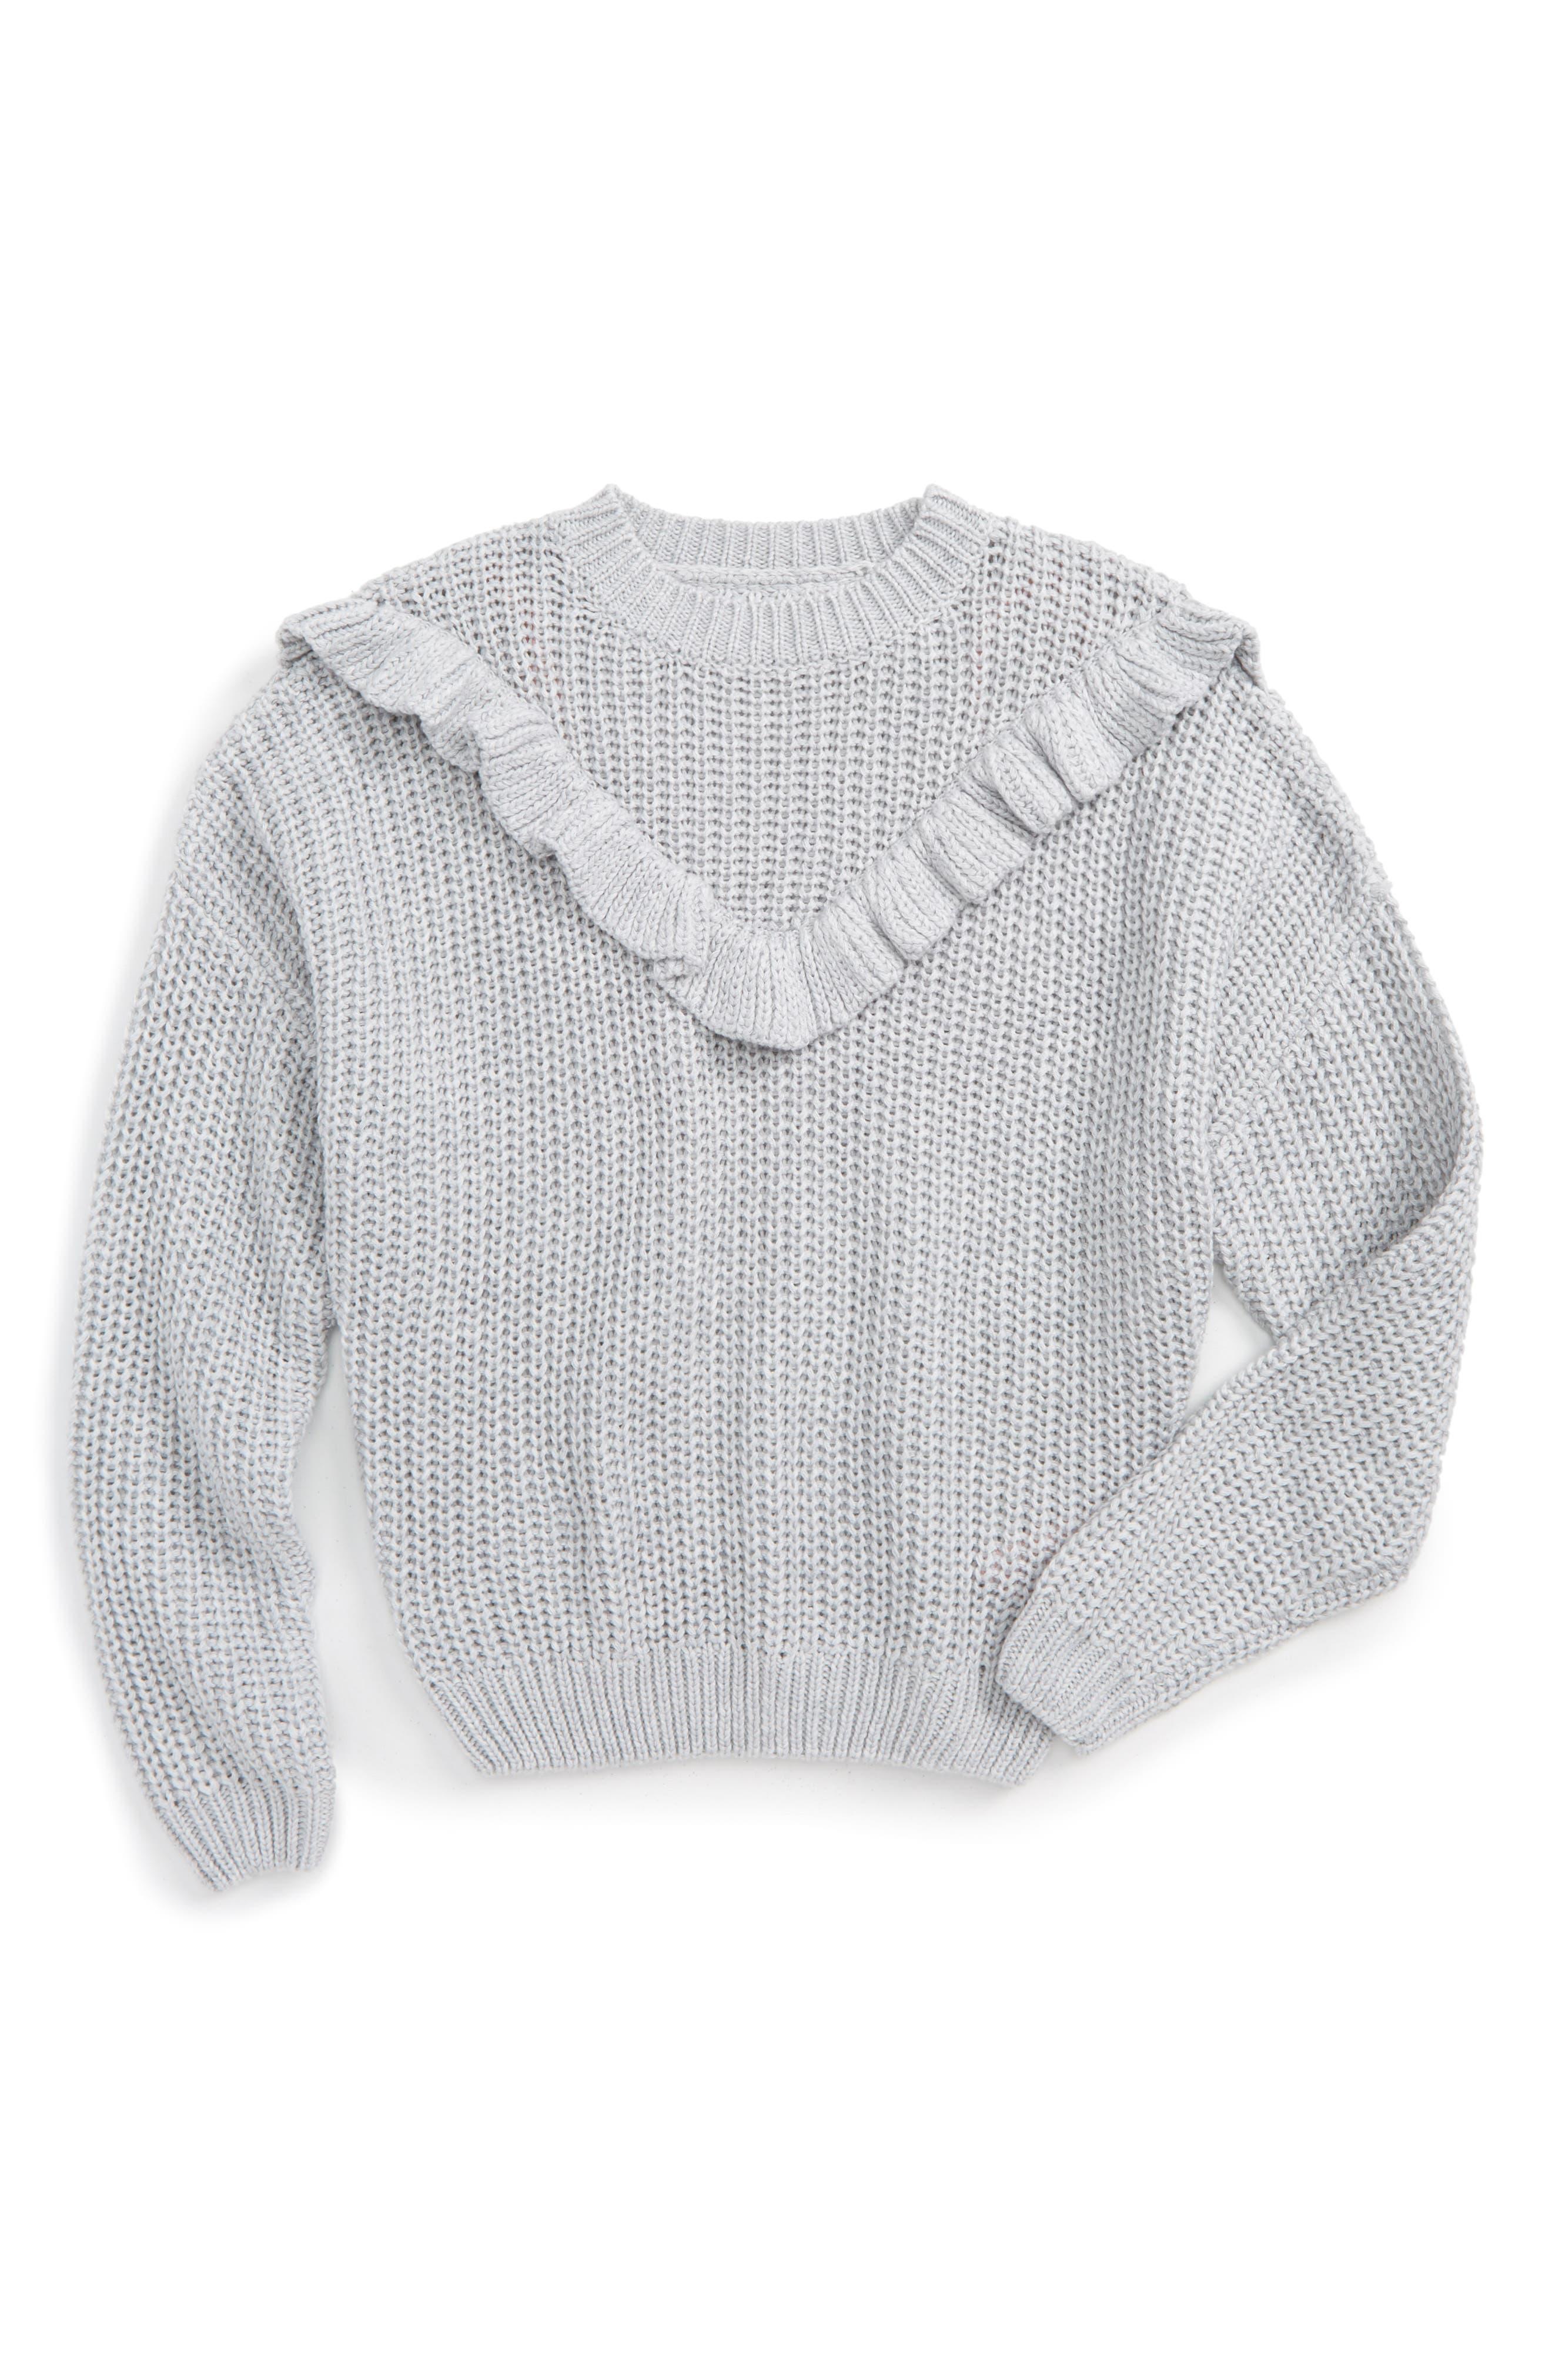 BLANCNYC Ruffle Sweater,                         Main,                         color, Grey